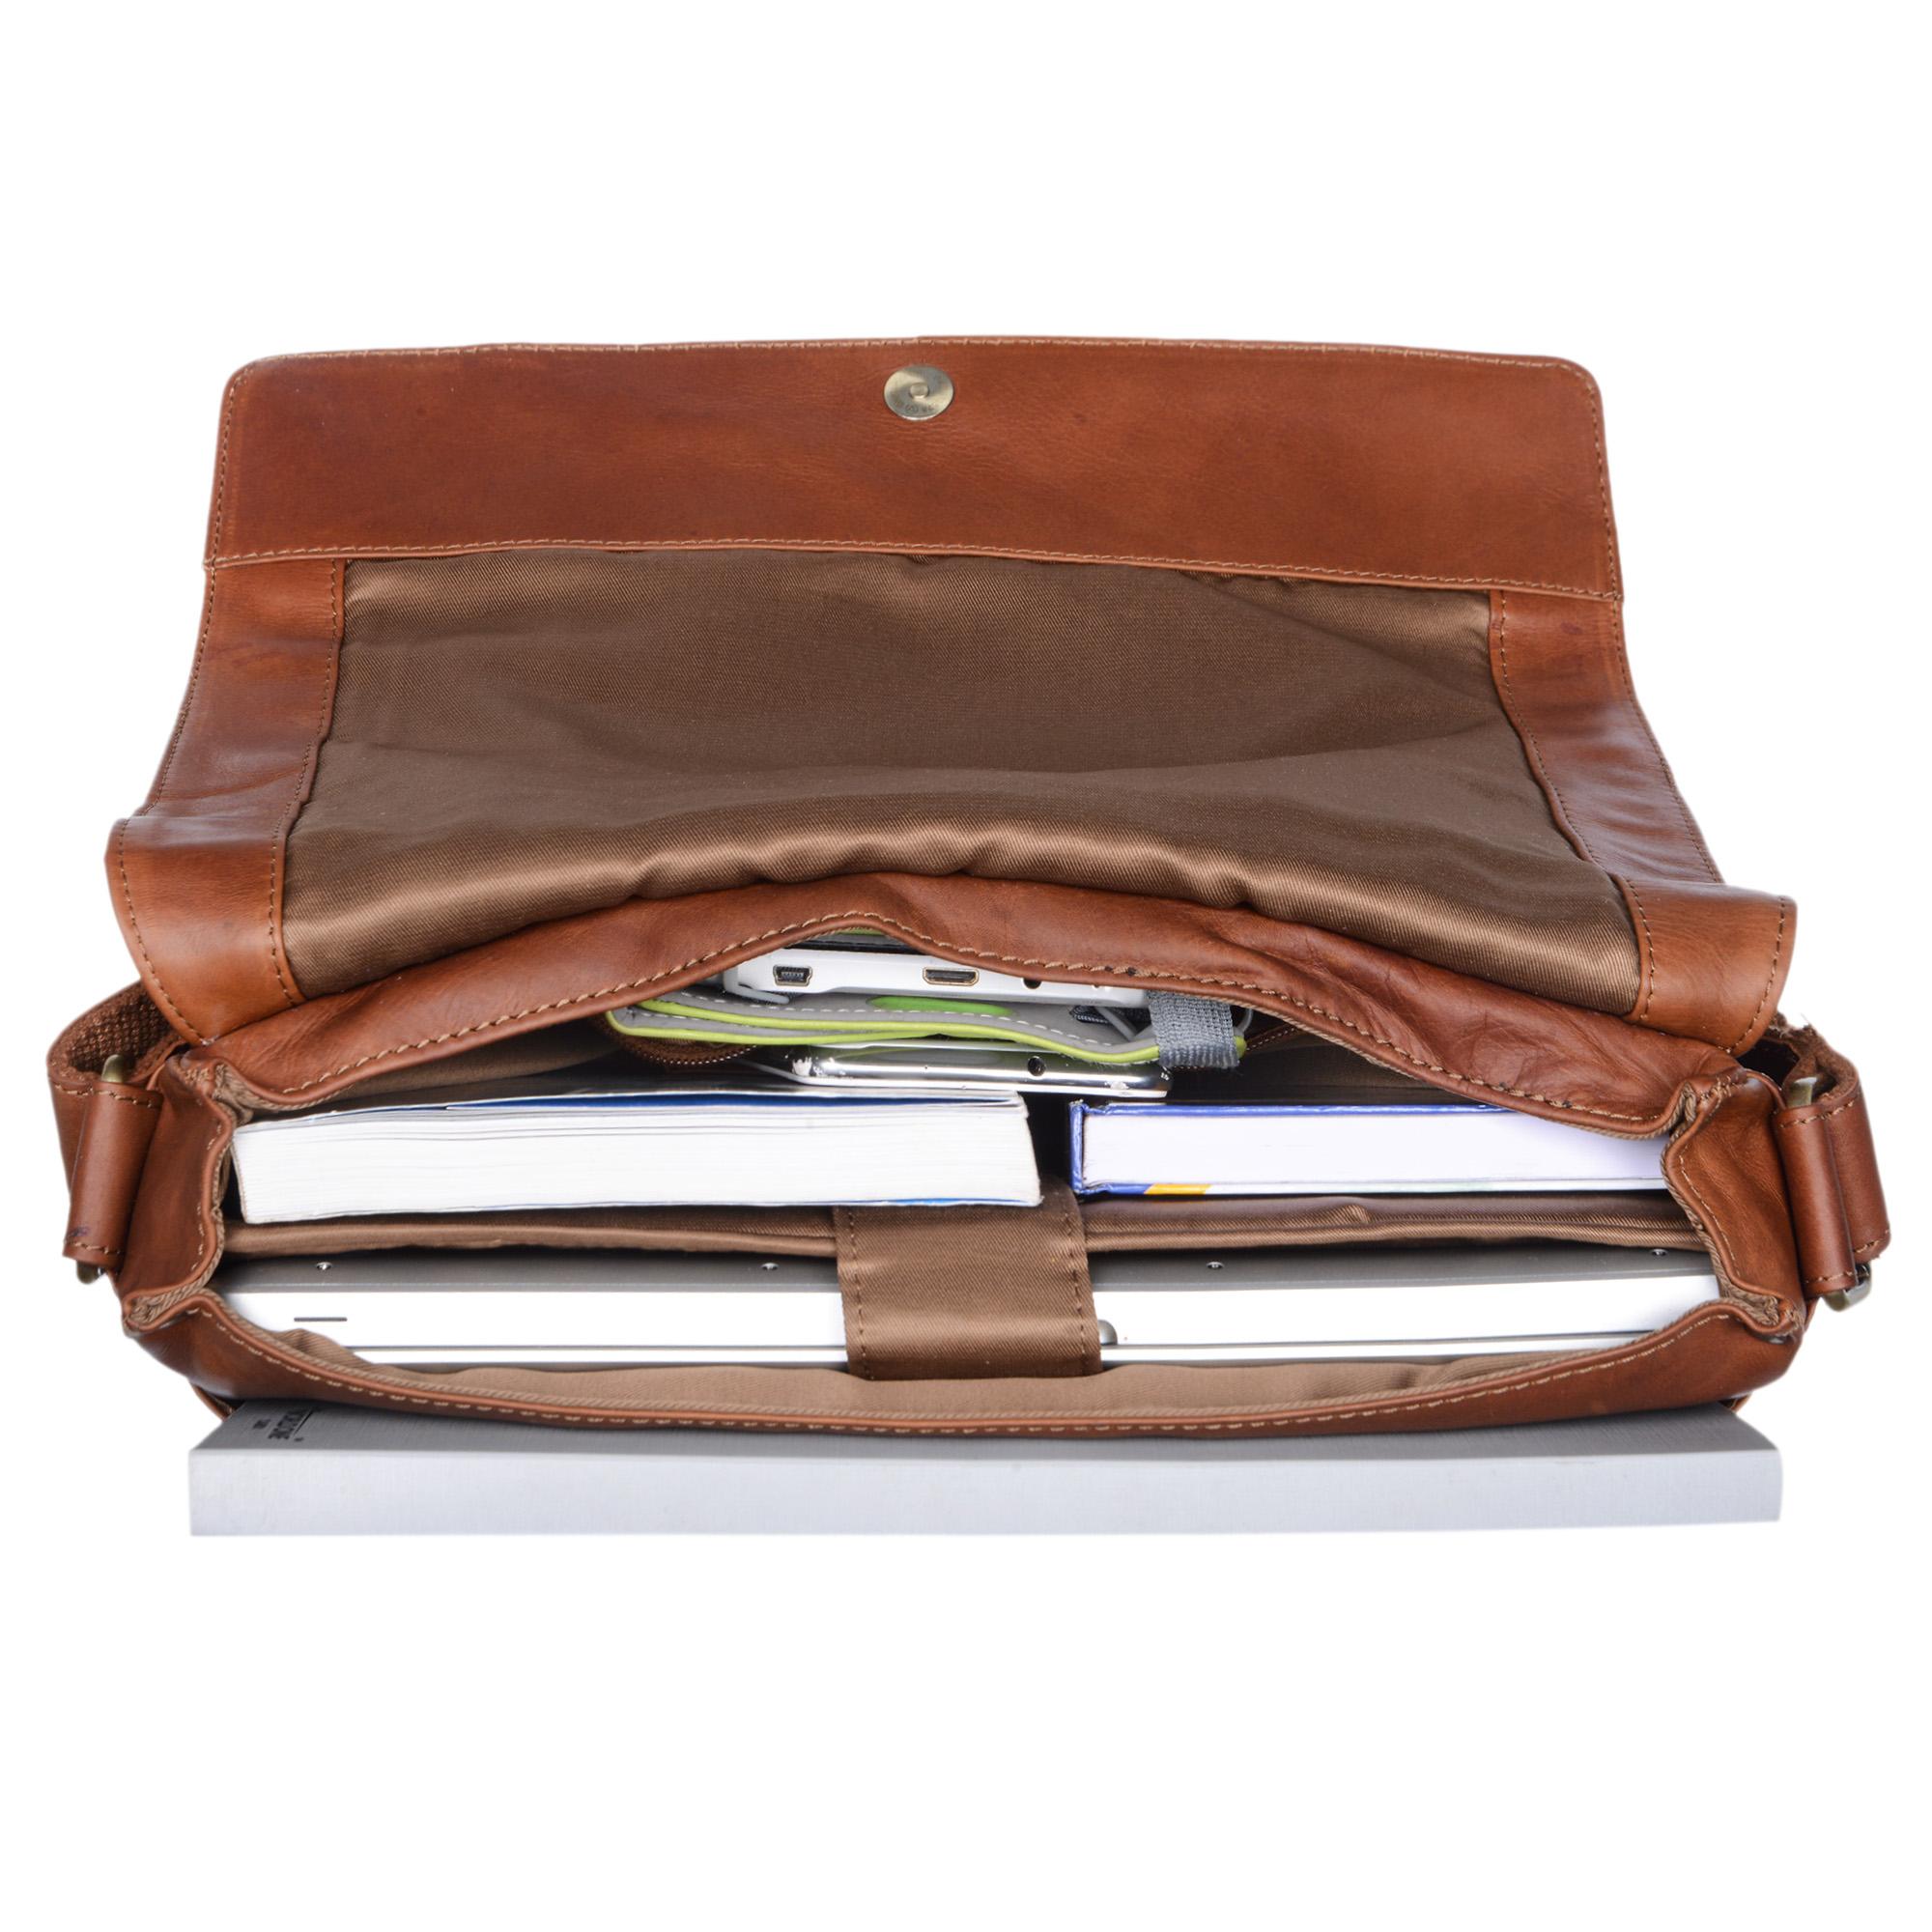 Laptoptasche 13 Zoll echtes Leder